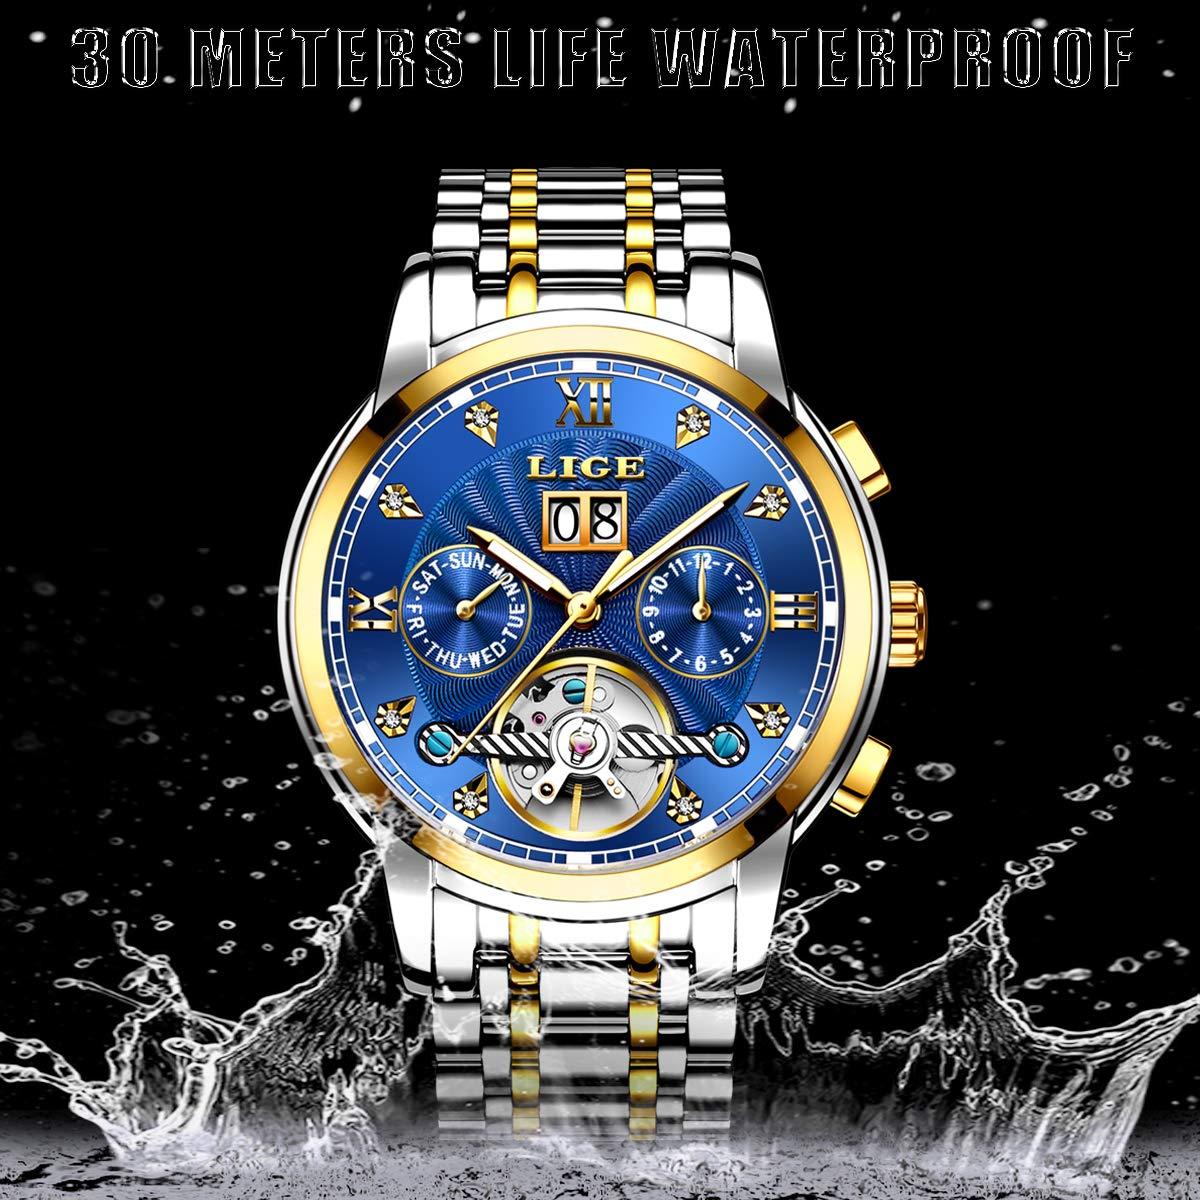 LIGE Relojes Hombres Moda Acero Inoxidable Impermeable Automático Mecánico Reloj Fecha Negocios Hombre Lujo Reloj De Pulsera Azul Dorado: Amazon.es: Relojes